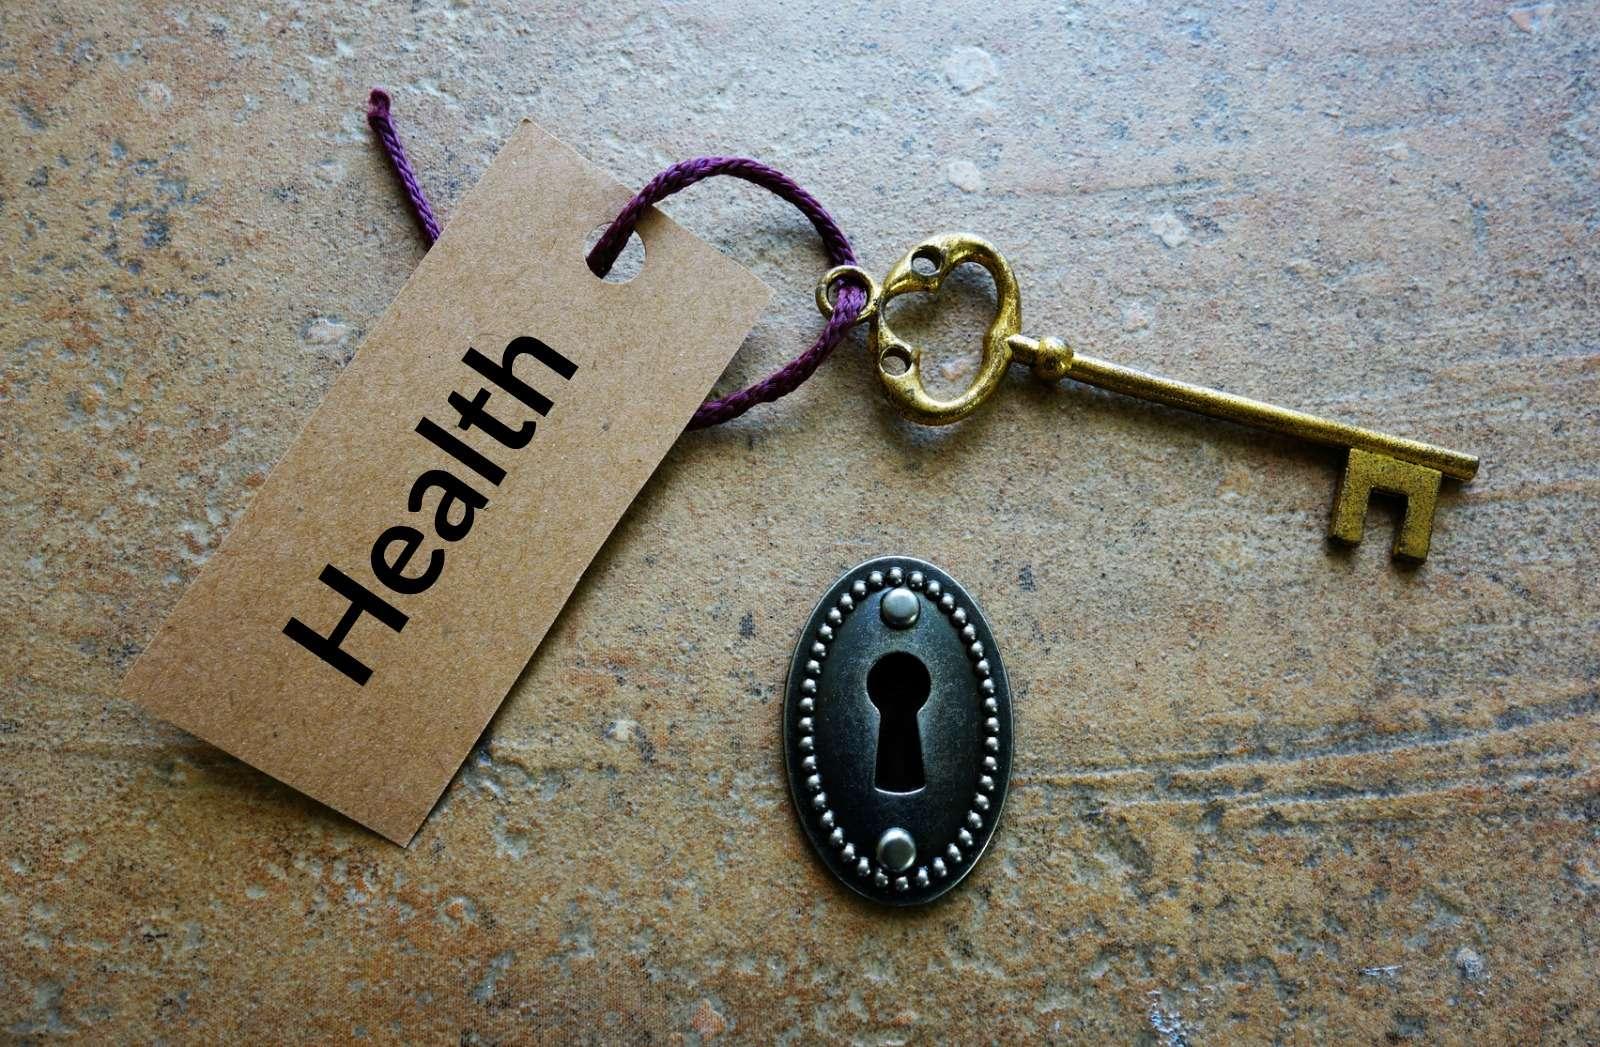 The Key to Stellar Health